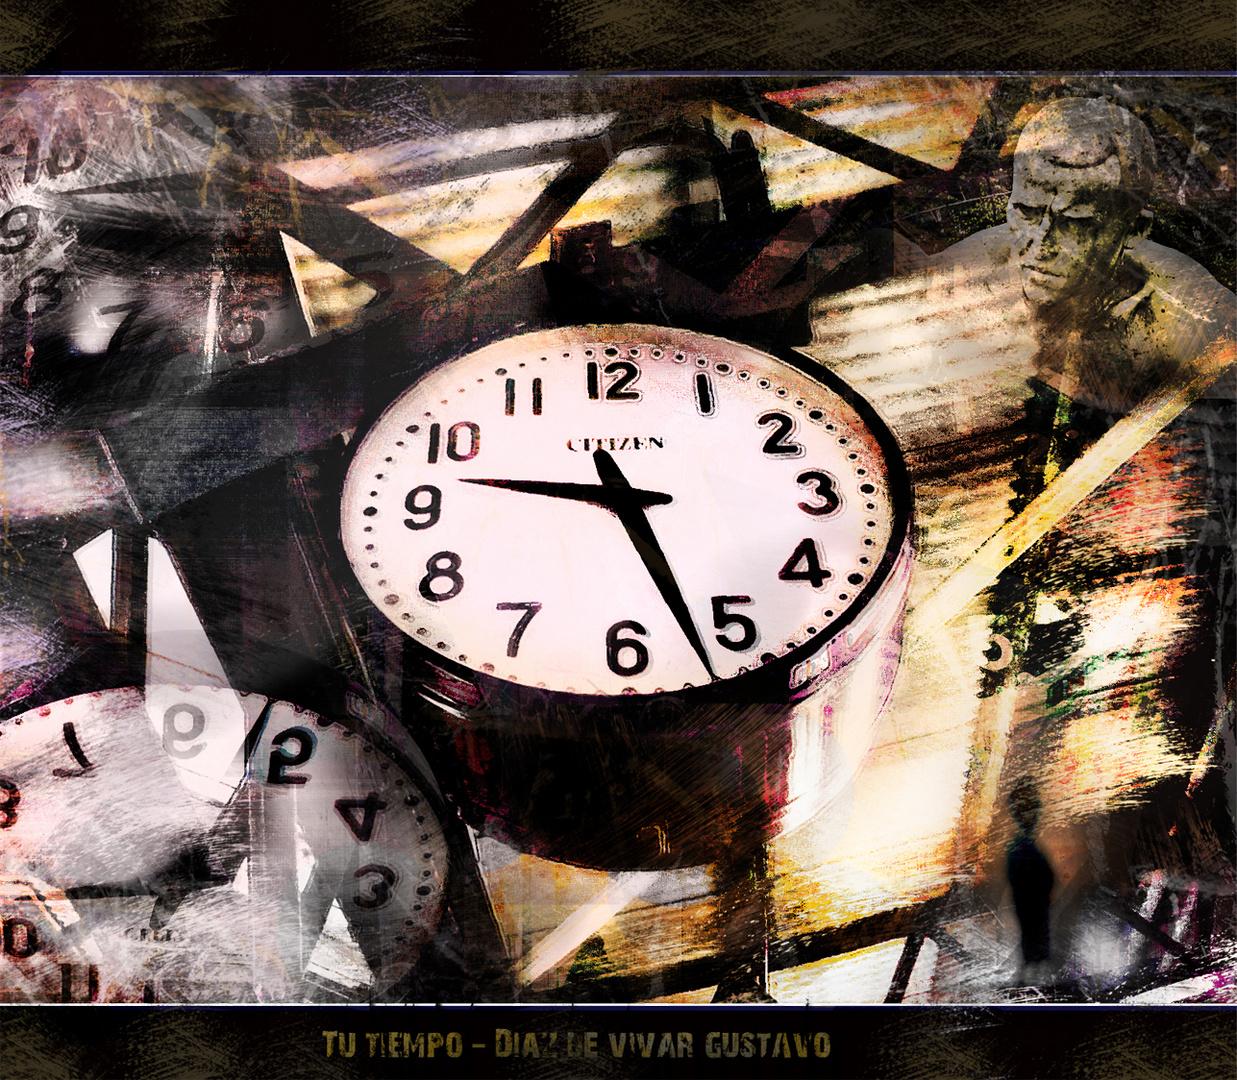 Tu tiempo